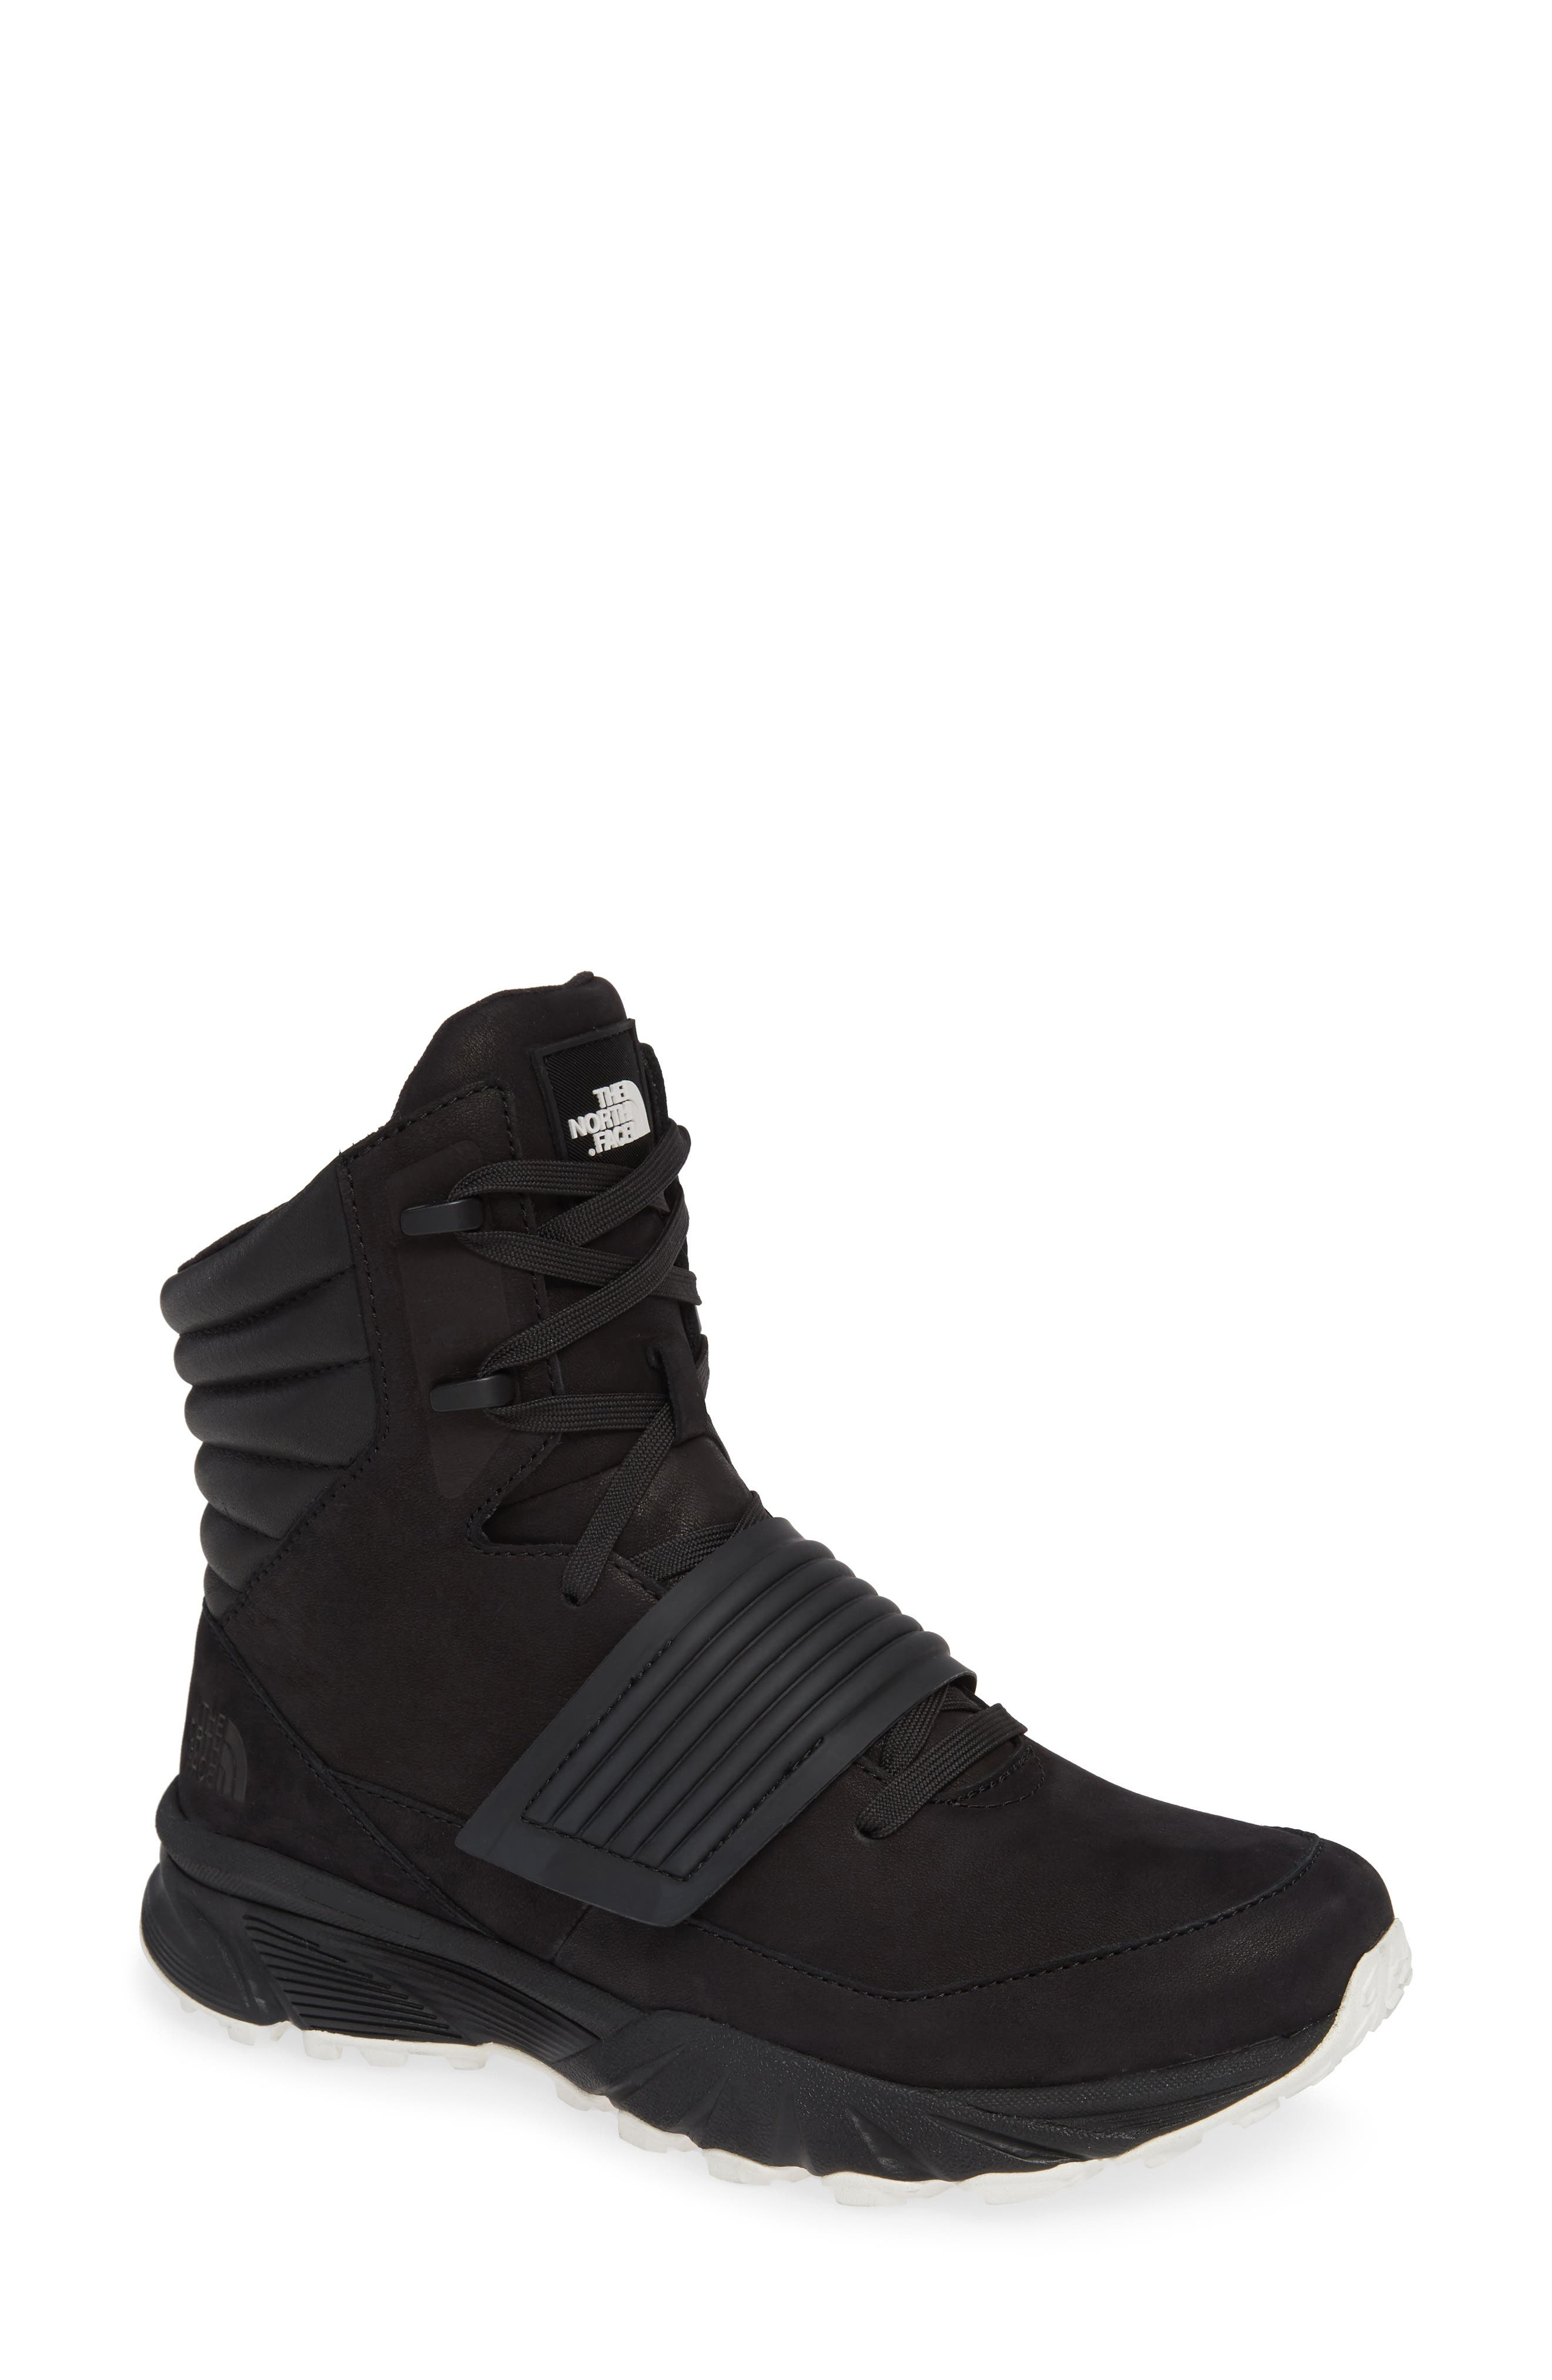 The North Face Raedonda Sneaker Boot, Black